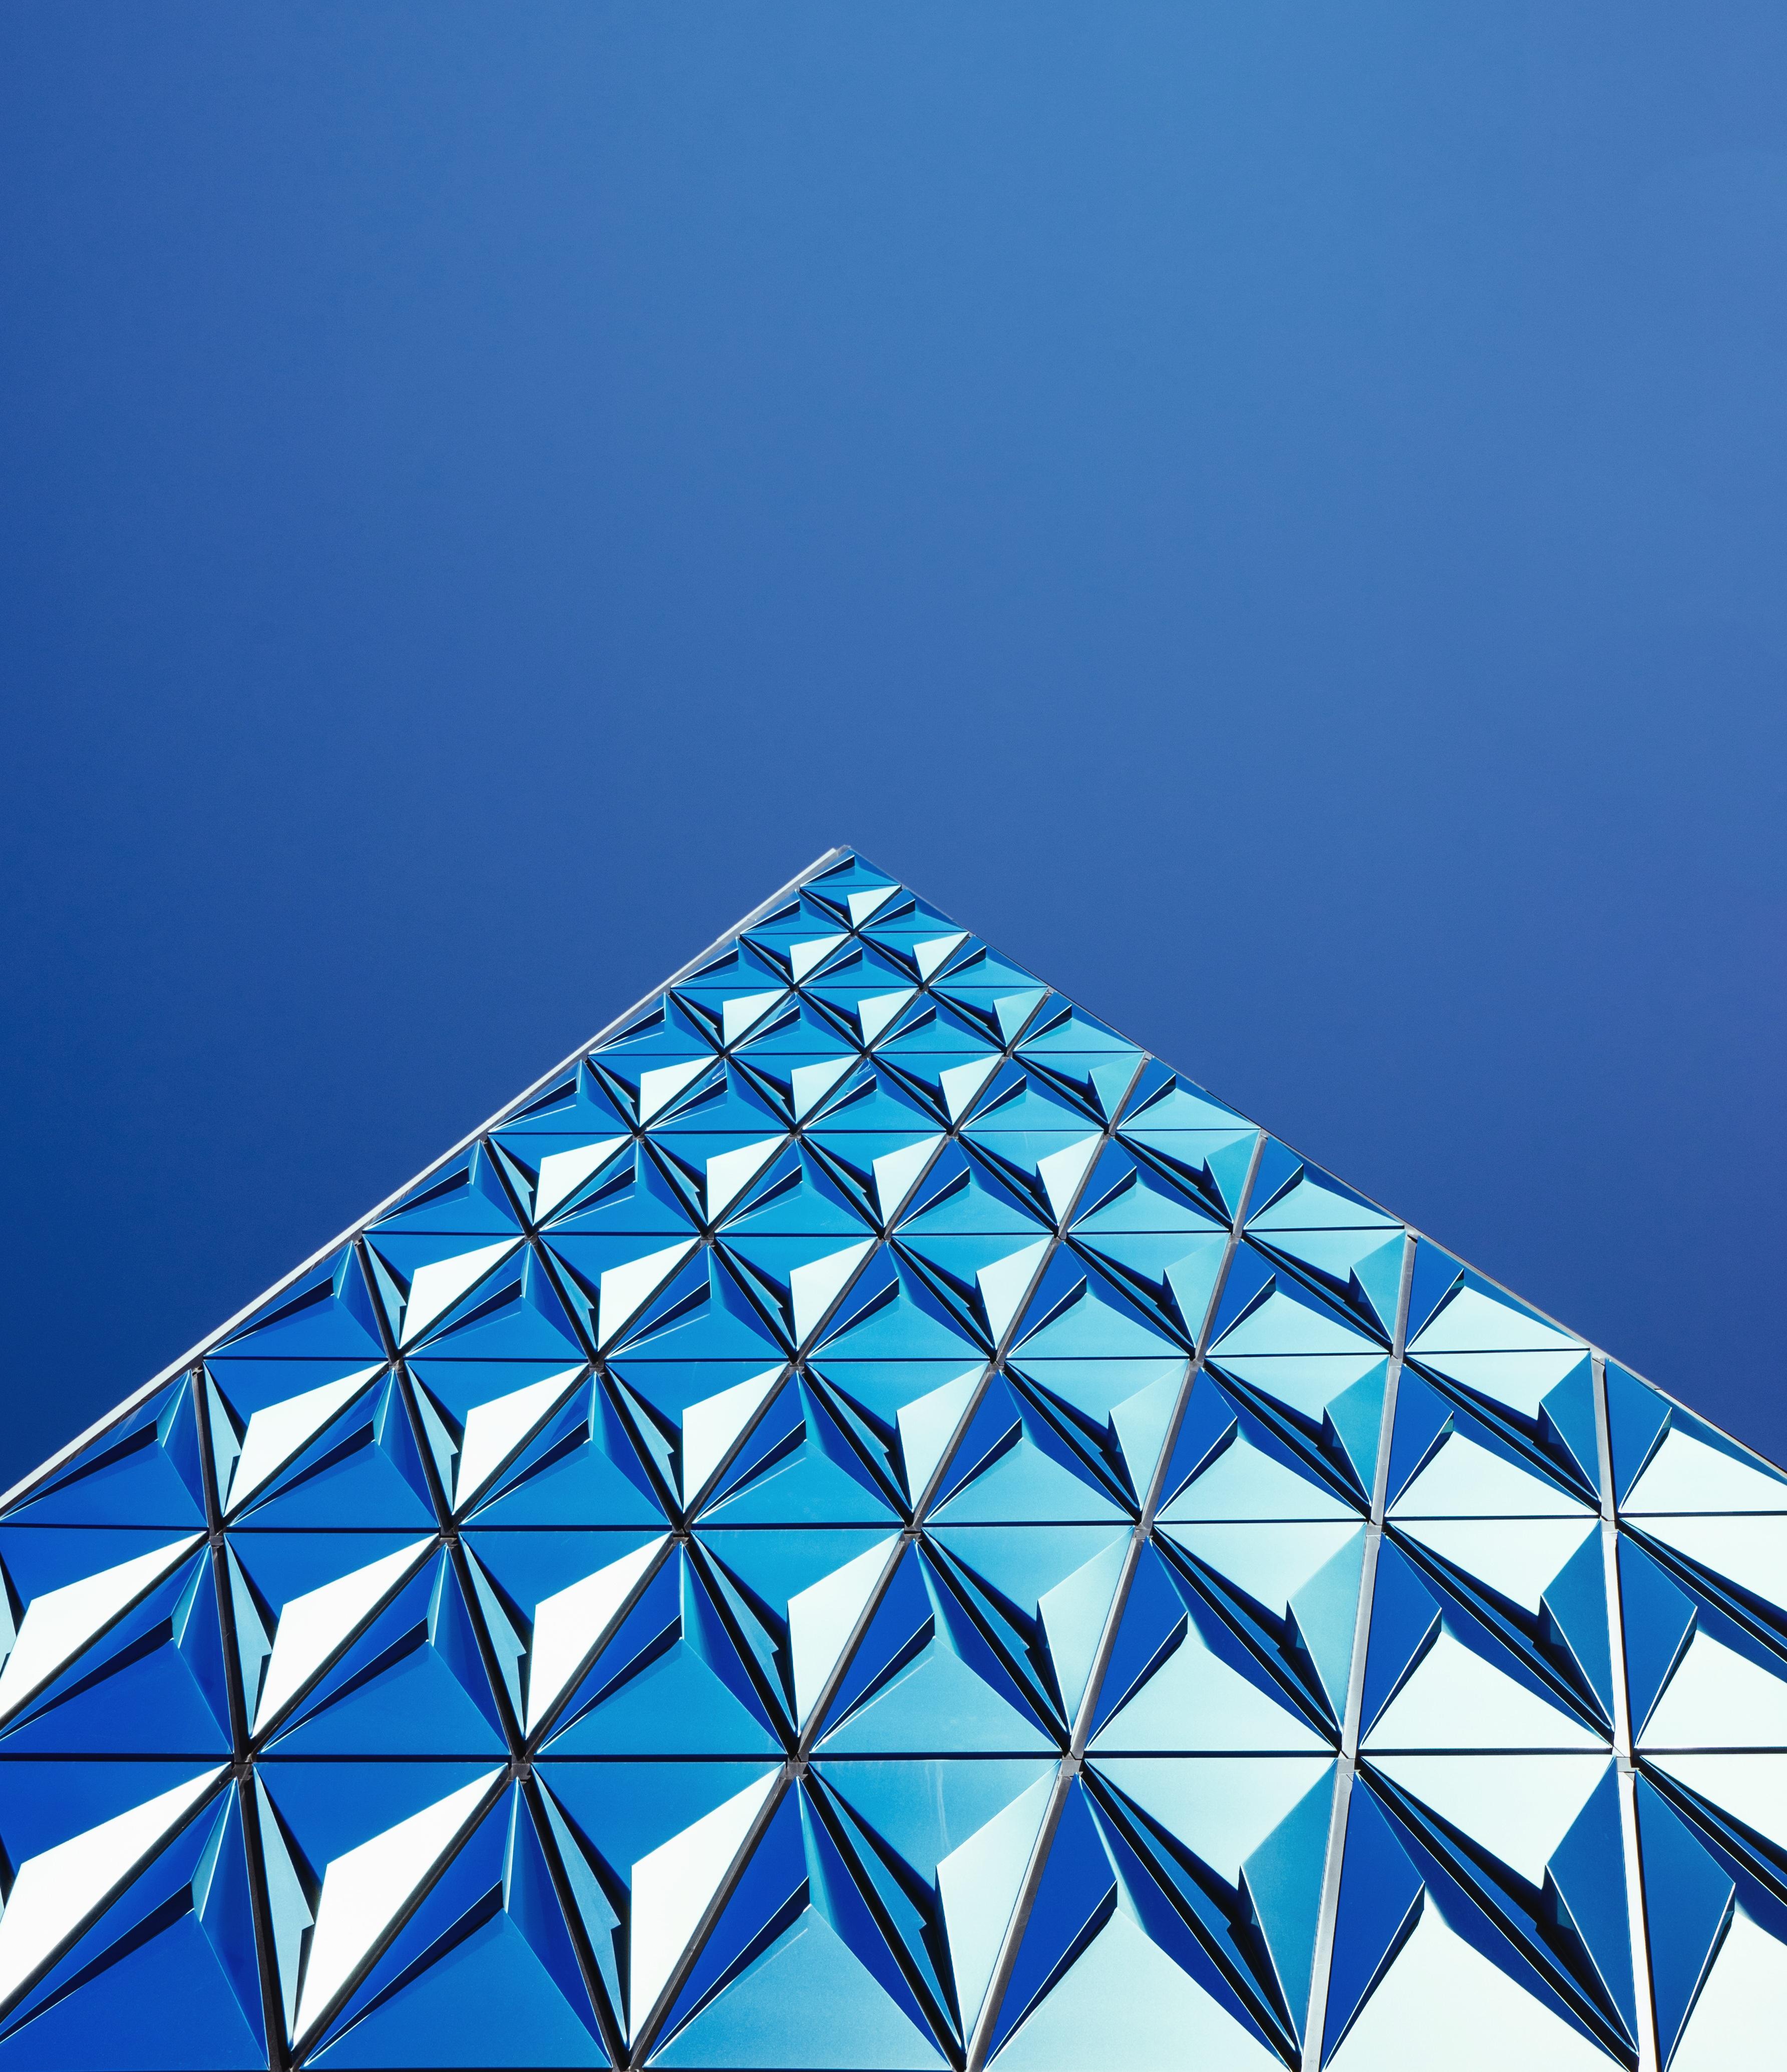 ... Lighting, Modern, Stadium, Circle, Blue Sky, Art, Design, Triangle,  Bright, Symmetry, Toronto, Contemporary, Shape, Architectural, Building  Exterior, ...